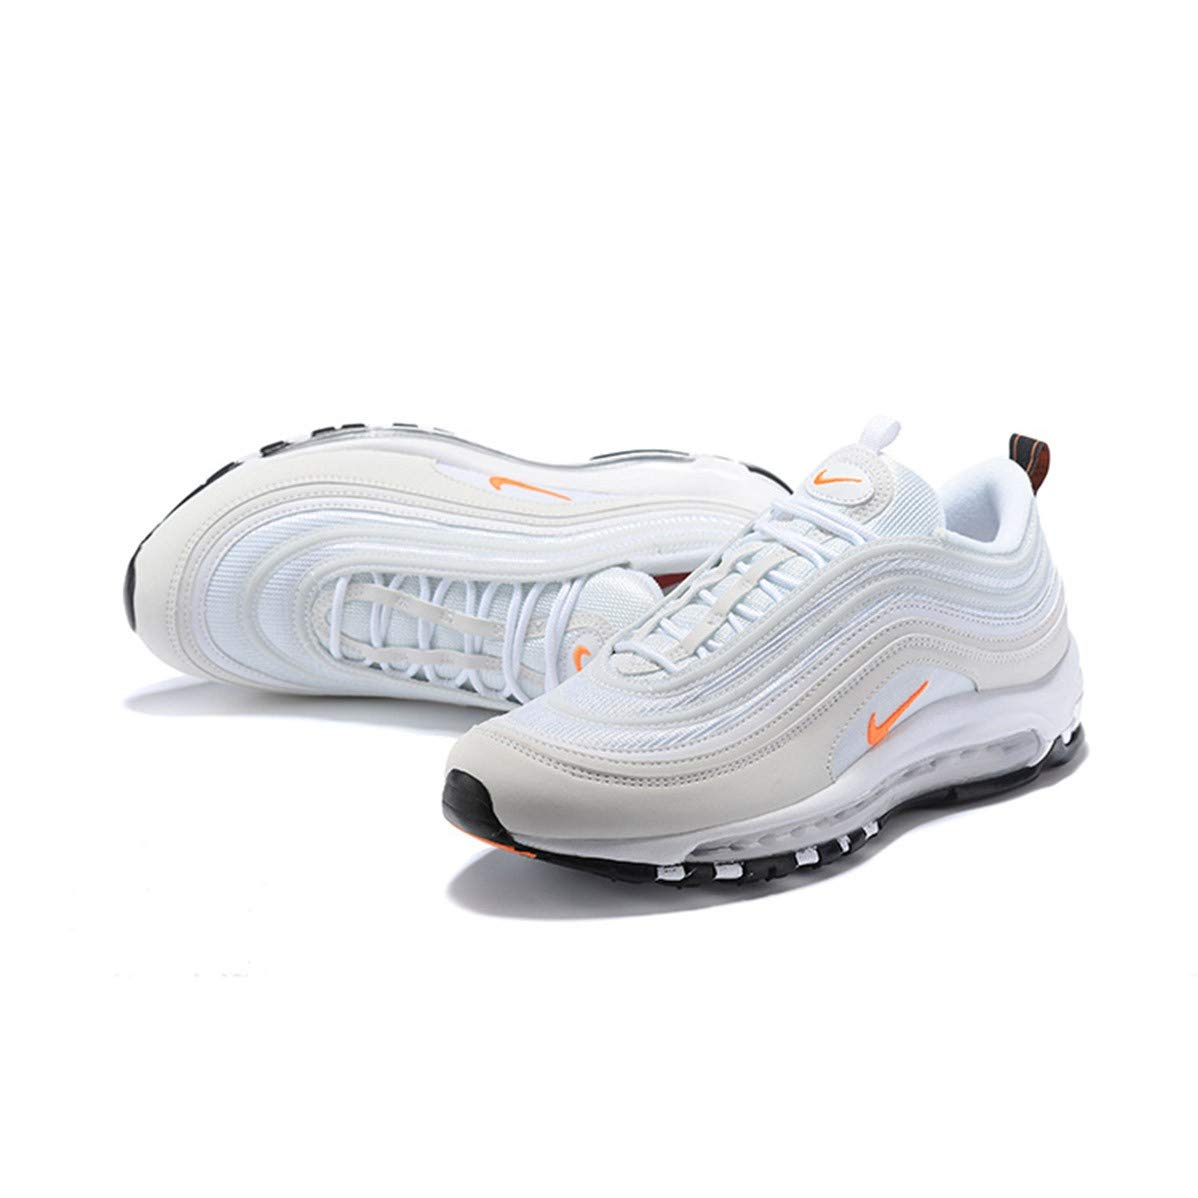 premium selection ef244 a72da Nike AIR MAX 97 Men's Sneaker Shoes in White Fabric BQ4567 ...